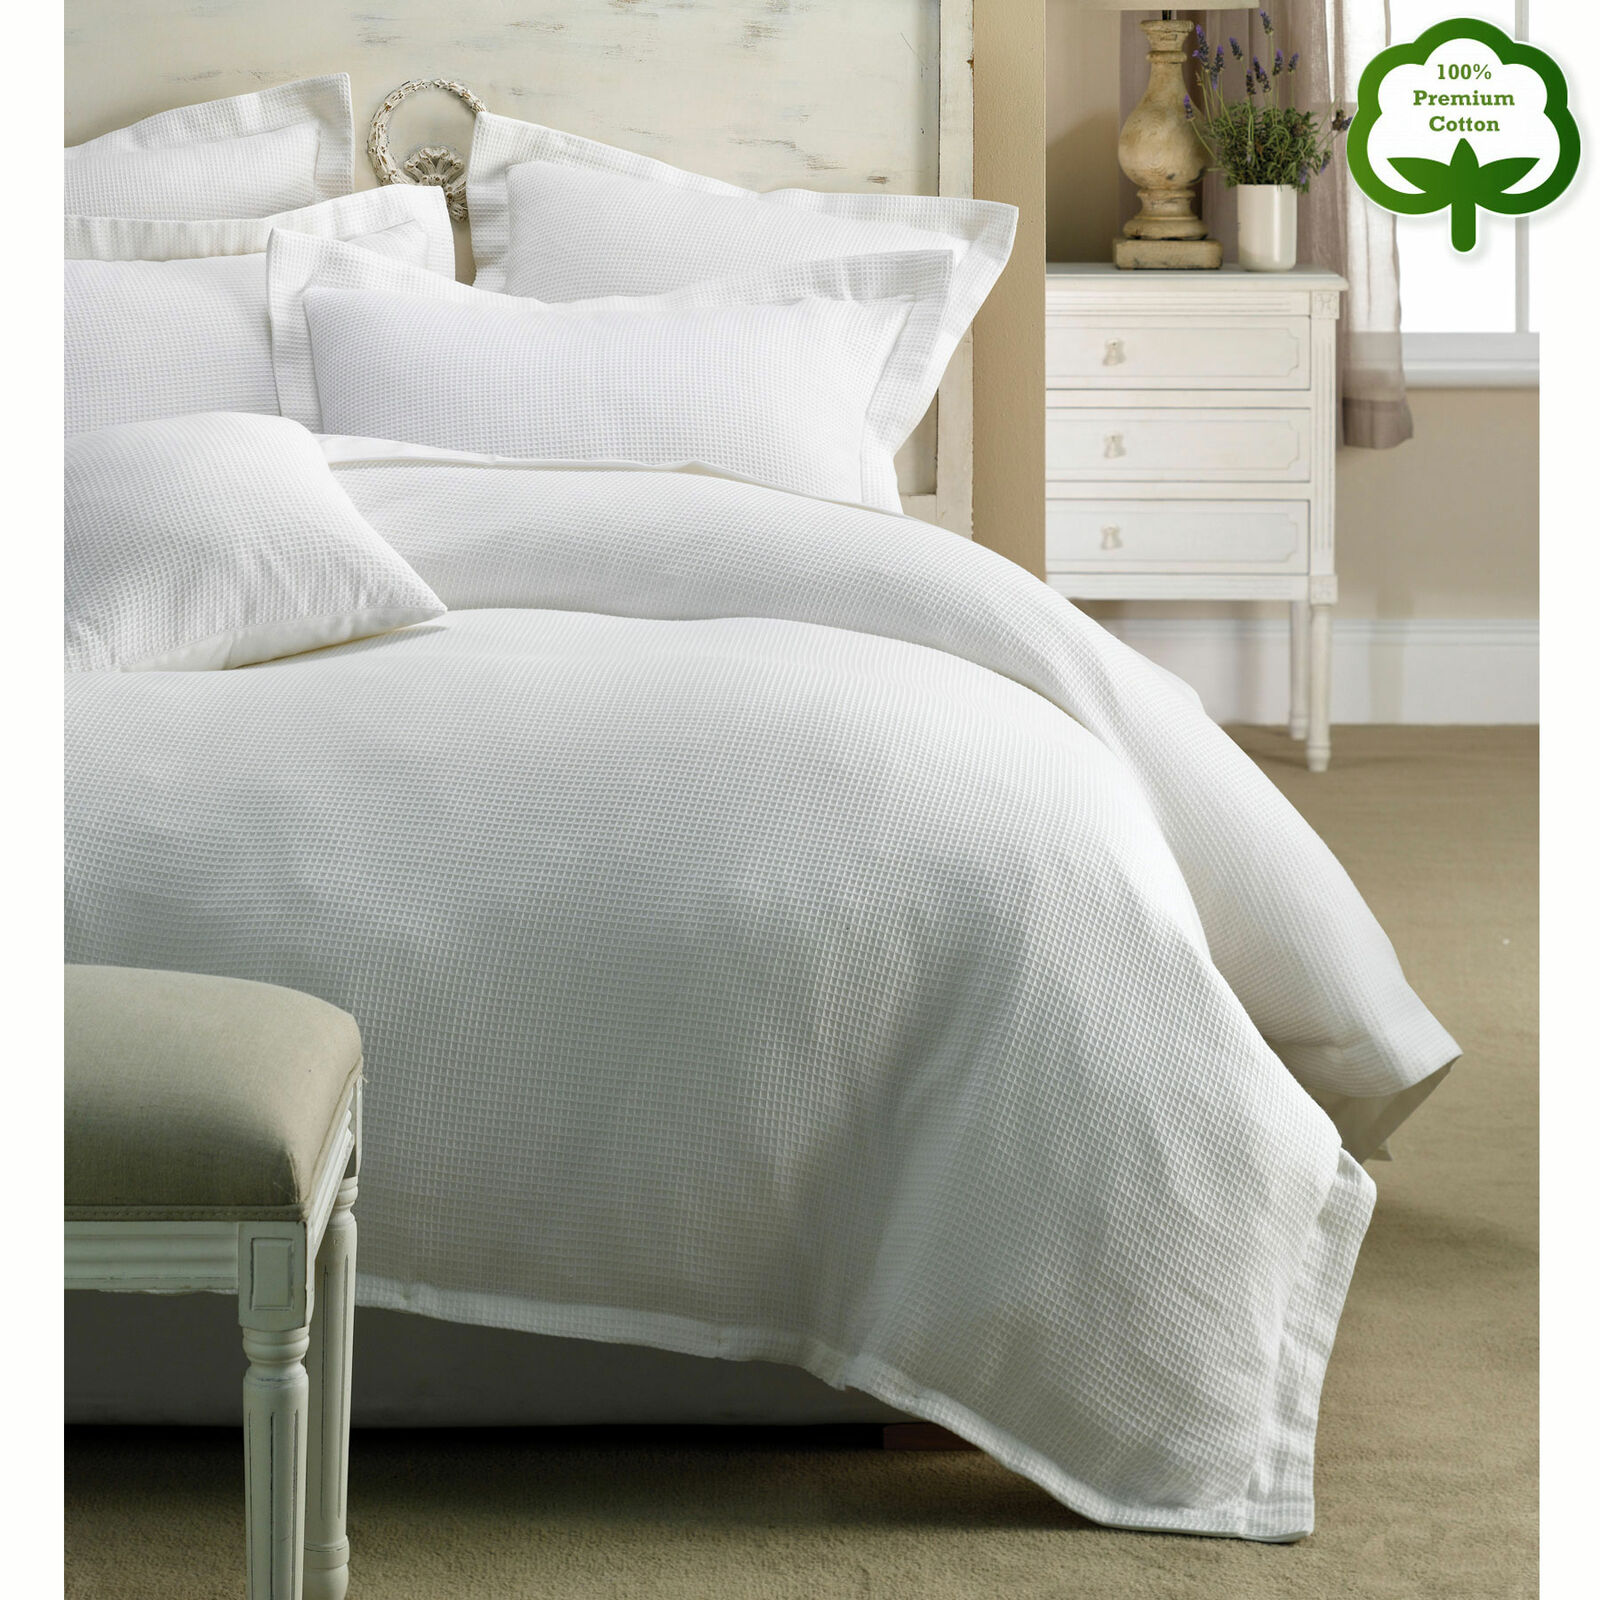 100% Cotton Paris Waffle Weiß on Weiß Quilt Cover Set - QUEEN KING Super King